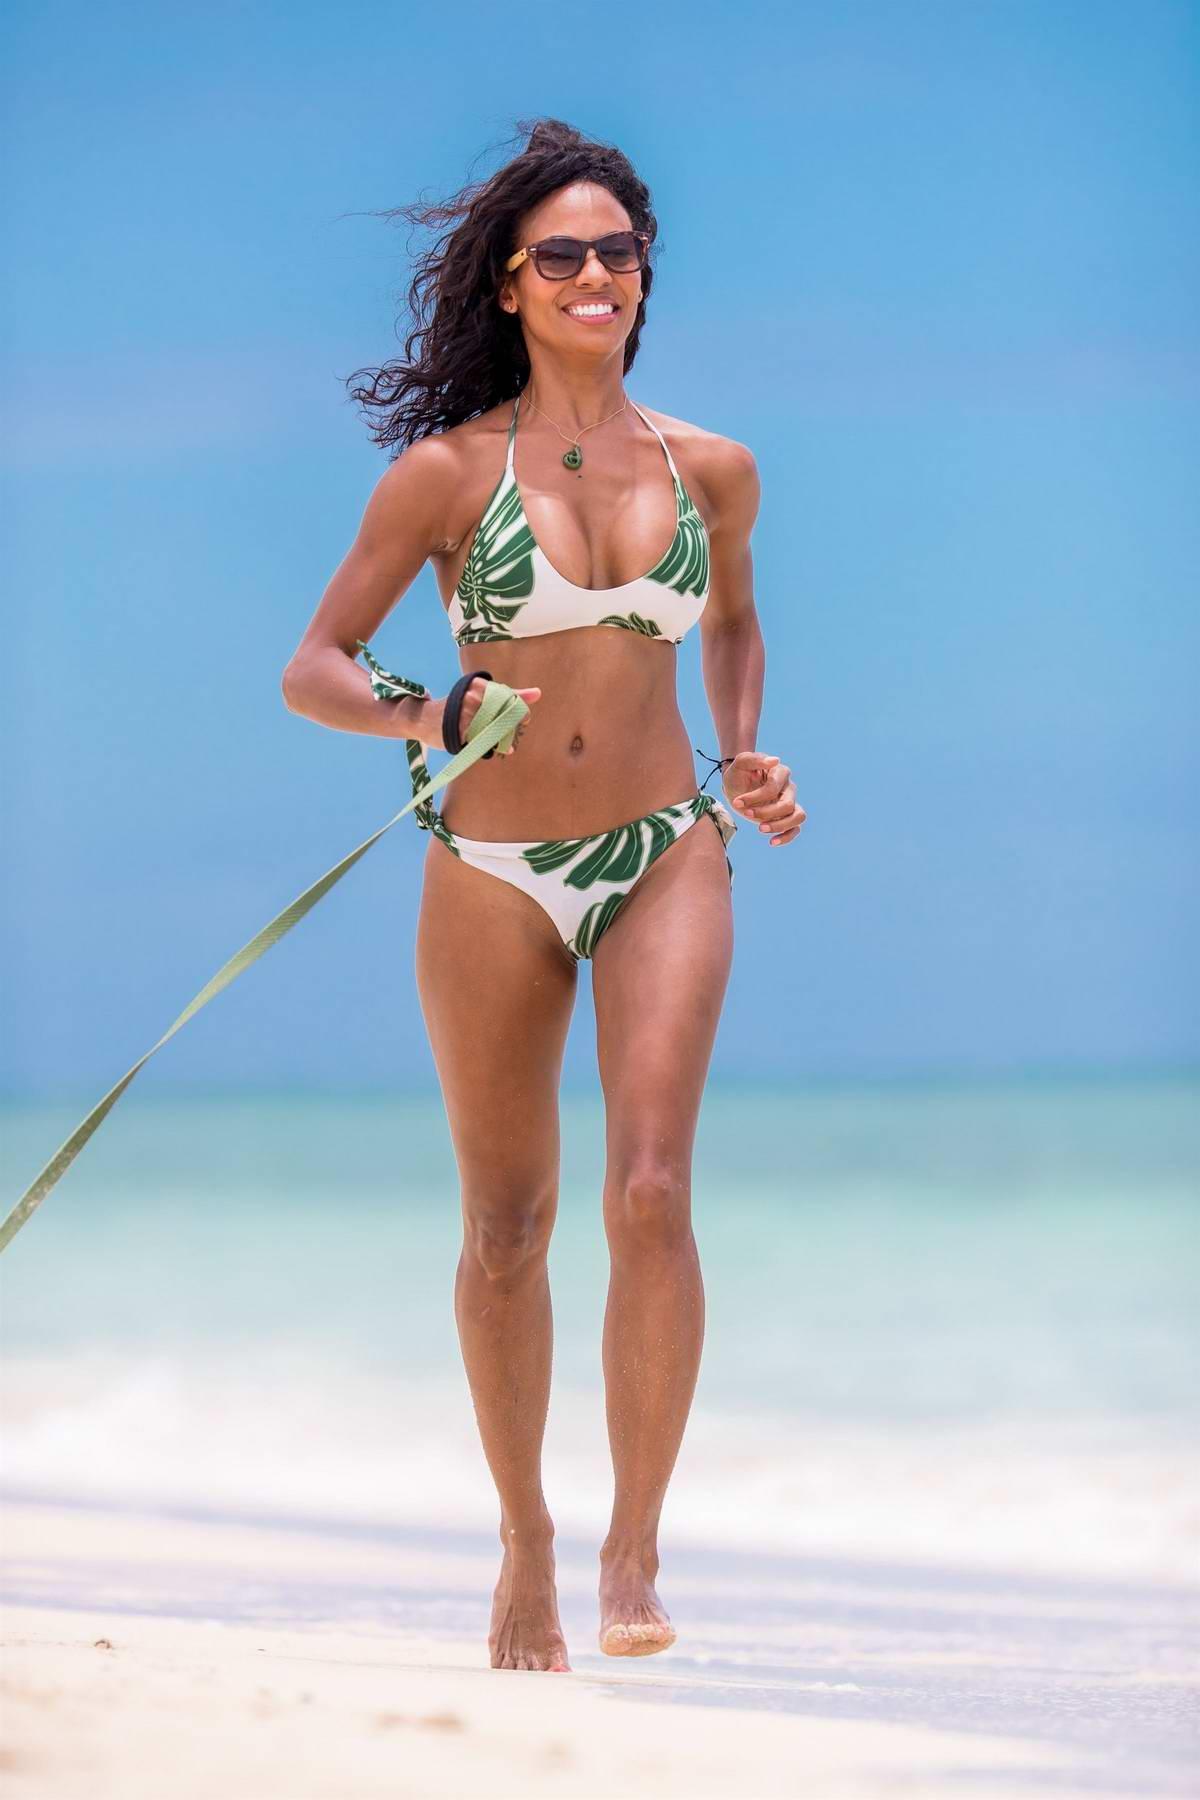 Candace Smith in a Bikini enjoying a day on the Lanikai Beach with her Dog in Hawaii